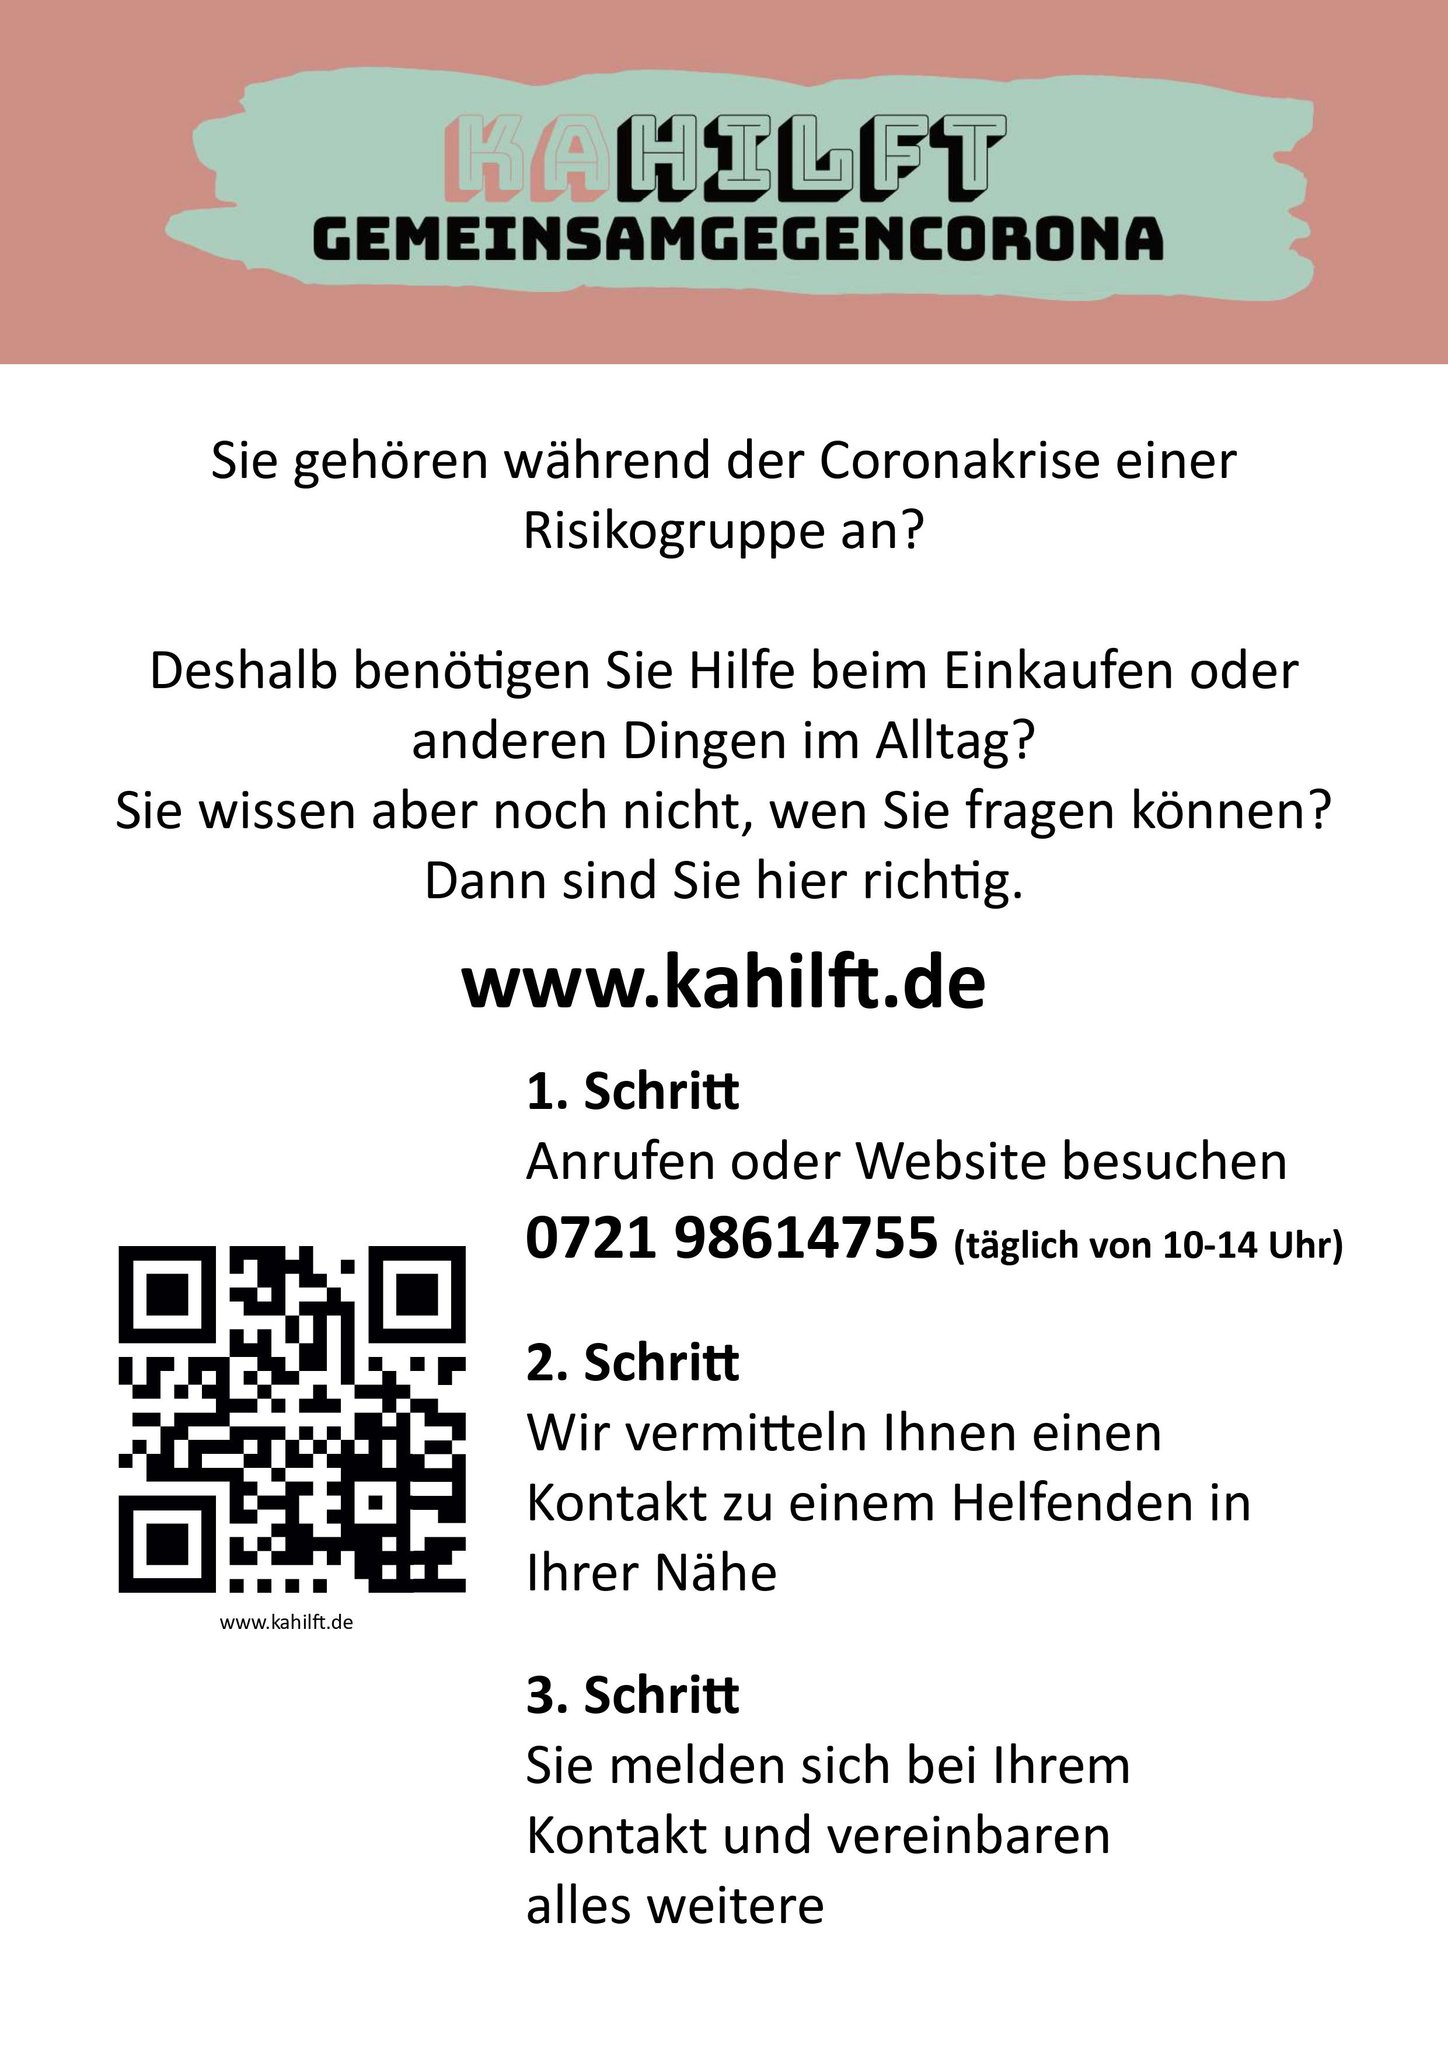 Corona Hotline Karlsruhe